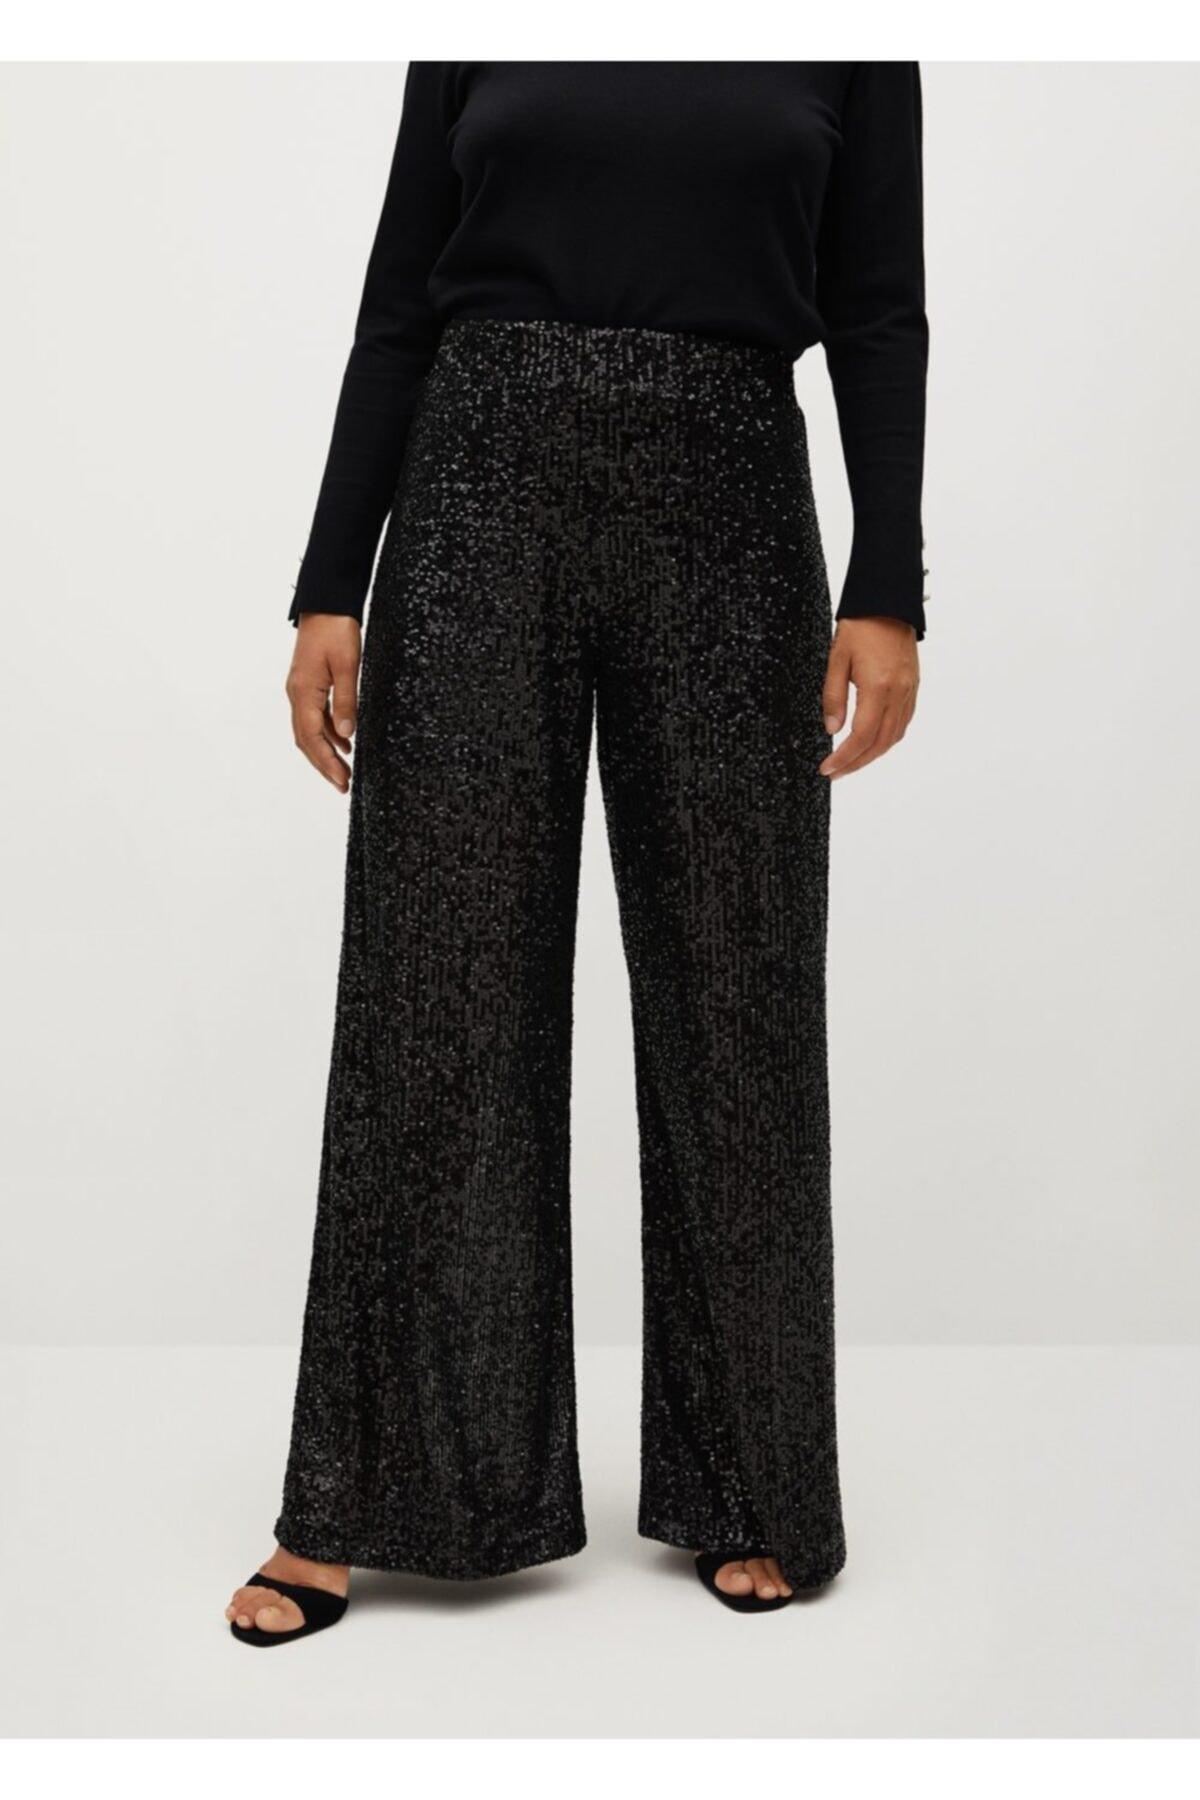 Violeta by MANGO Kadın Siyah Pantolon 77049204 2